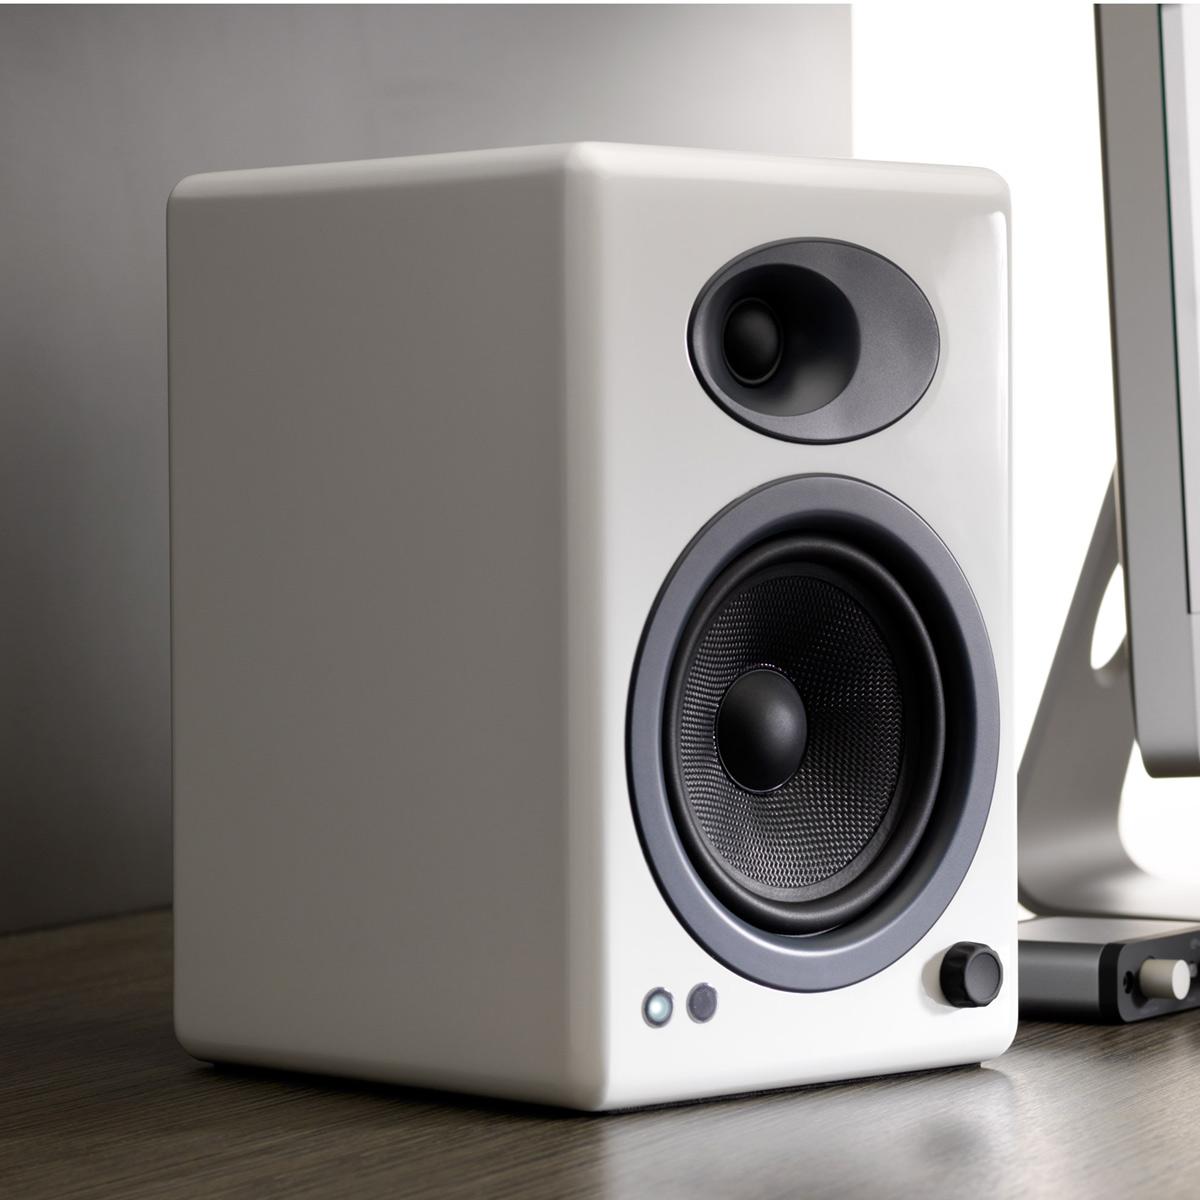 Audioengine-A5-Classic-Powered-Bookshelf-Speakers-Pair thumbnail 12